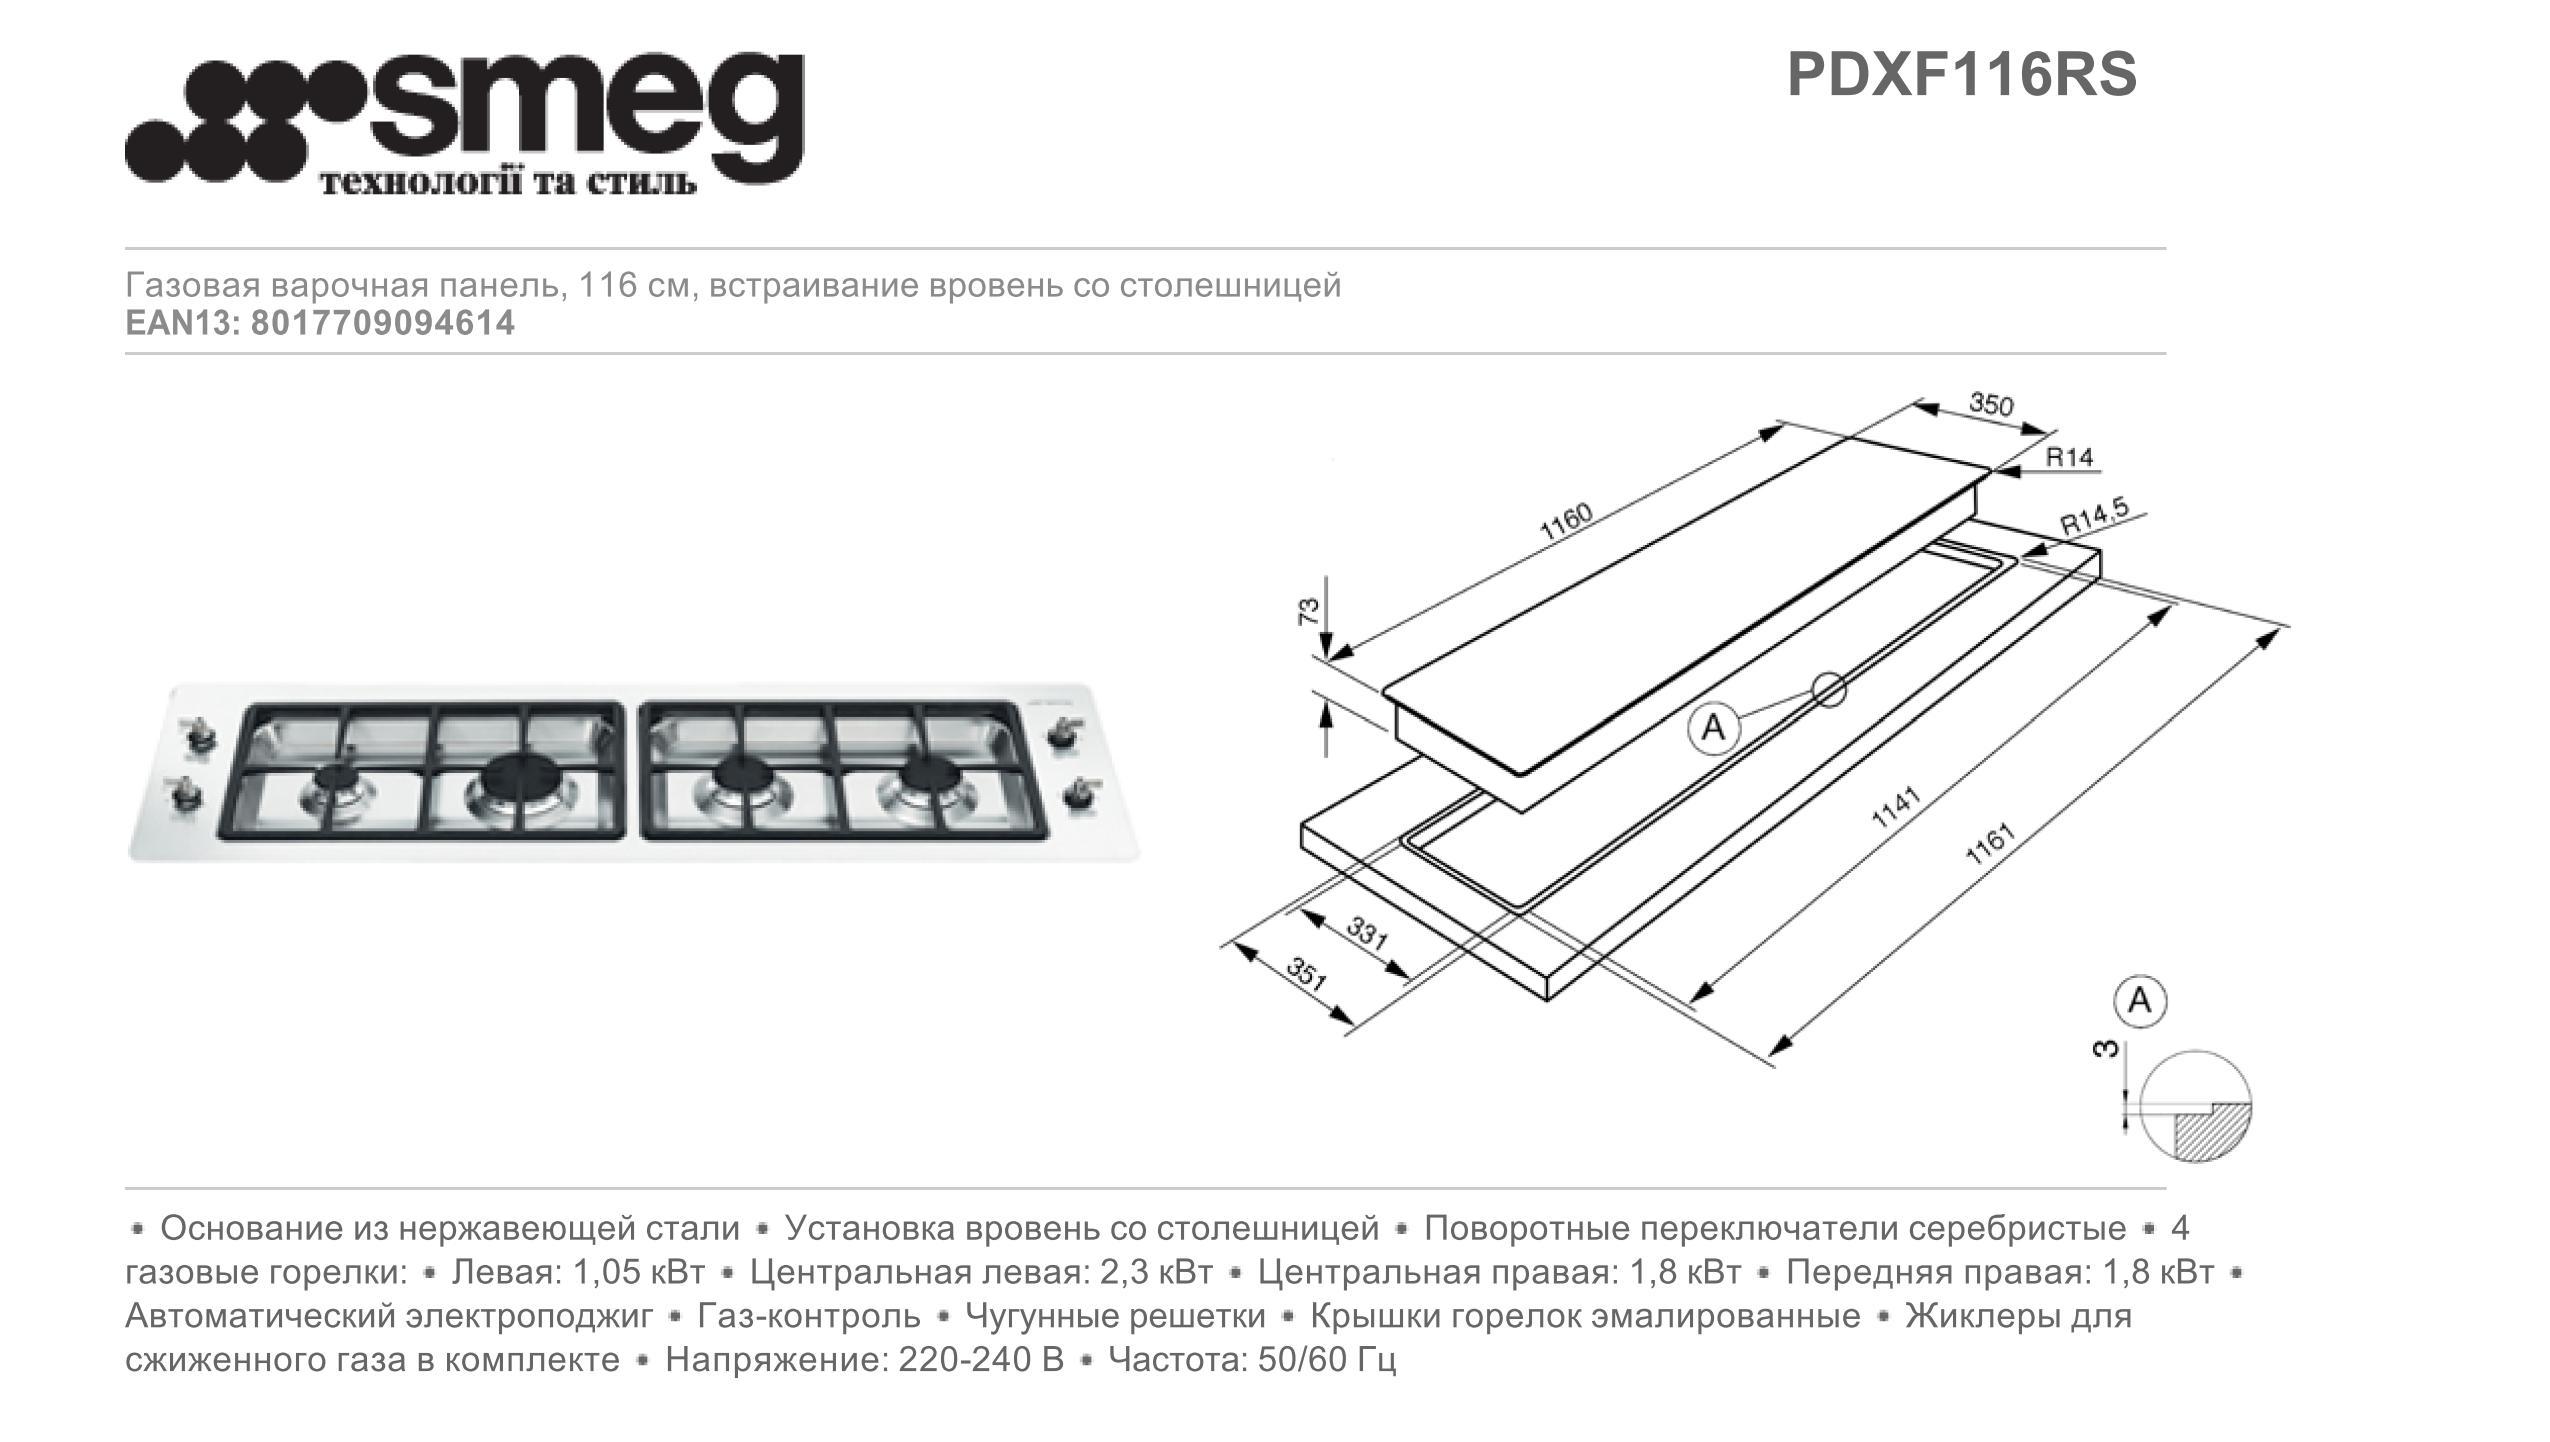 http://www.btmarket.com.ua/img_upl2/PDXF116RS_mini.jpg